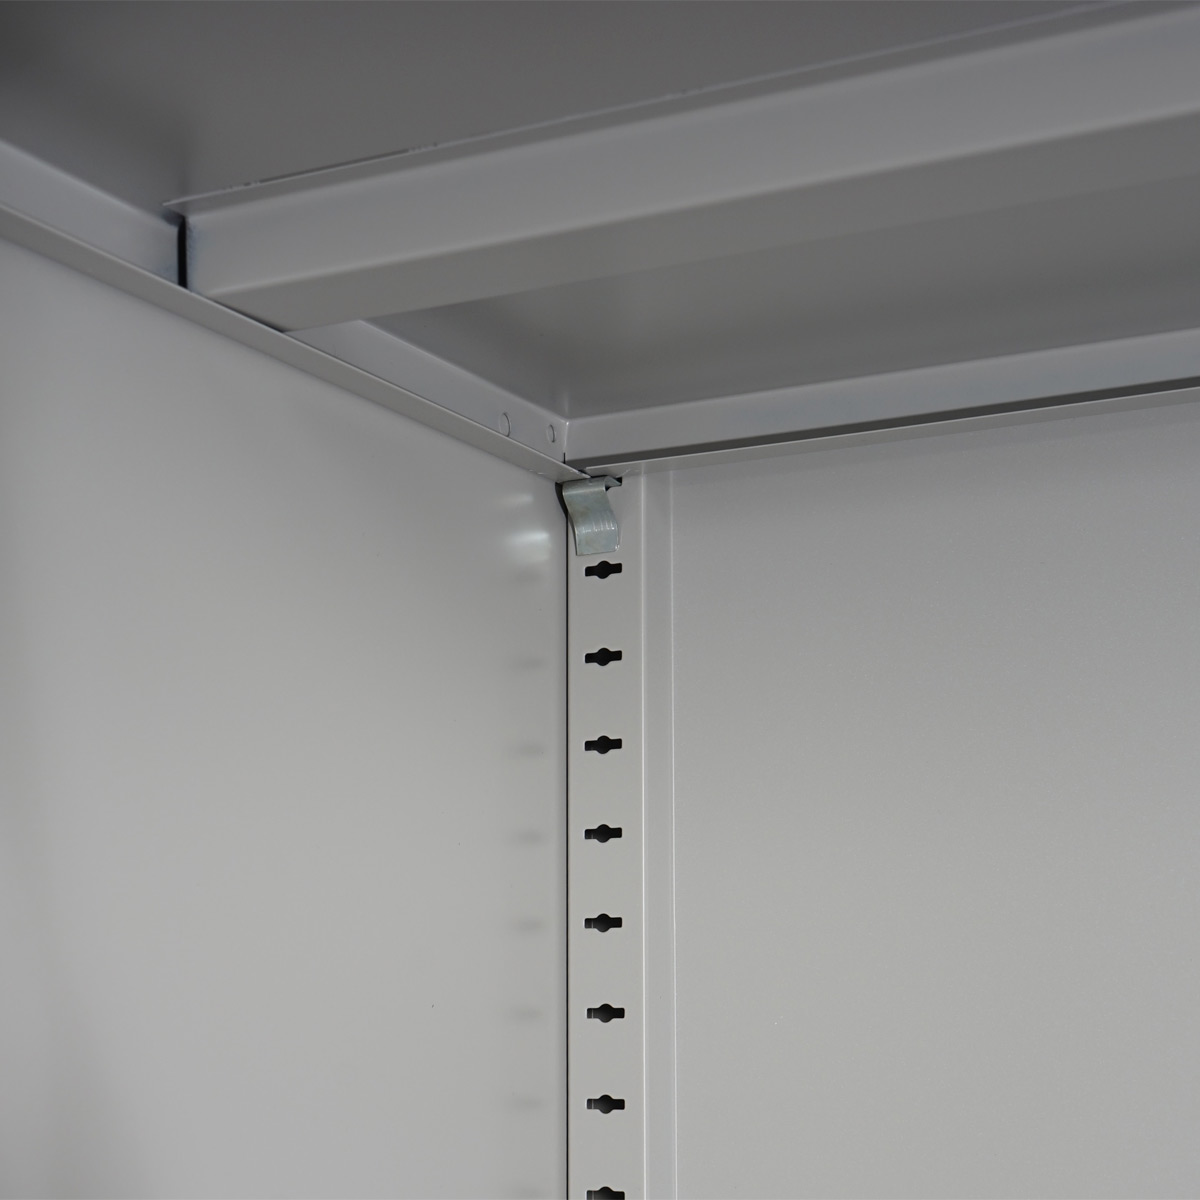 Aktenschrank Boston T130, Metallschrank Büroschrank, 47kg 2 Türen ...